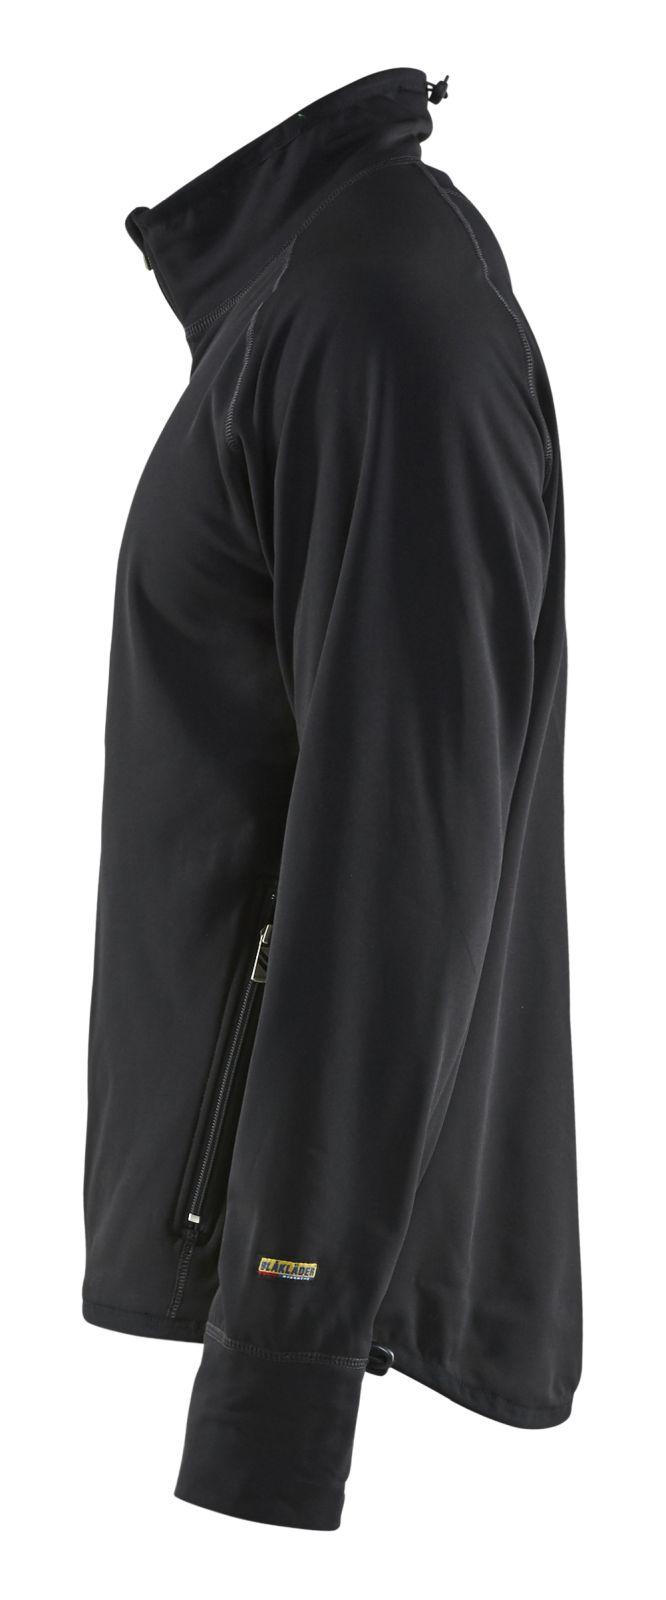 Blaklader Fleece vesten 48442522 zwart(9900)